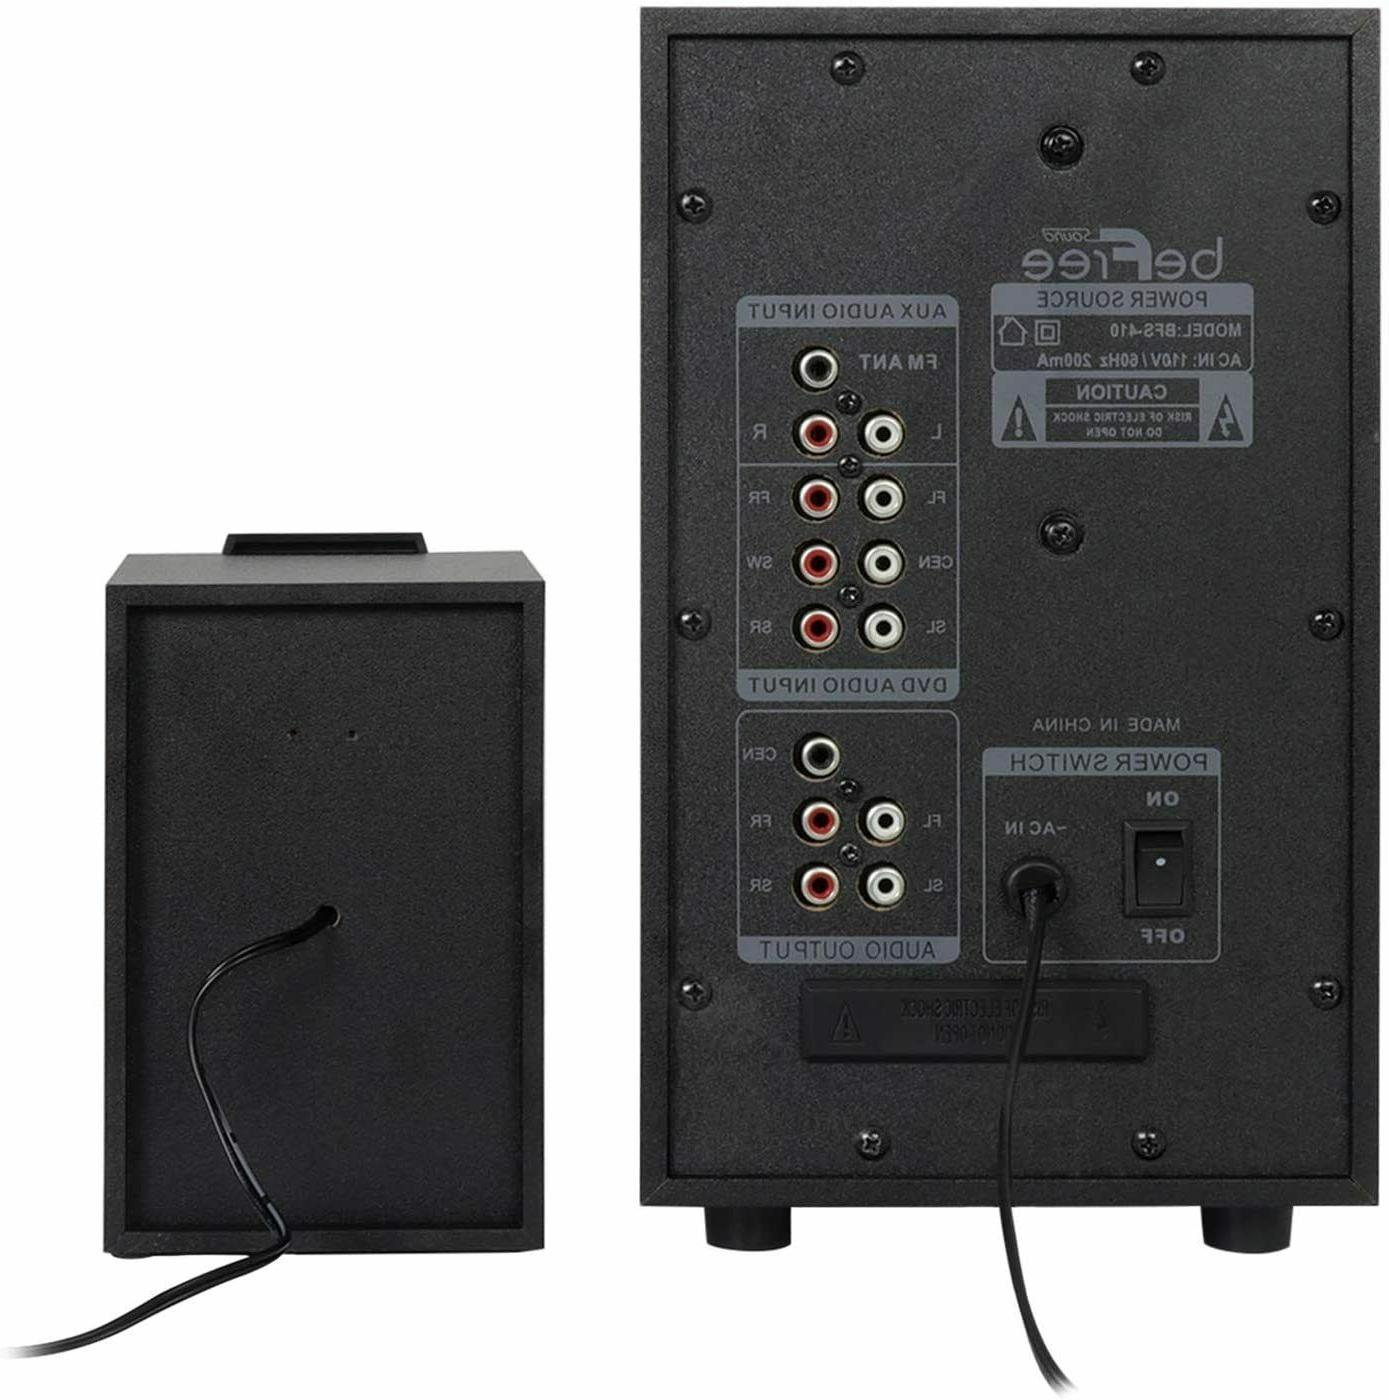 Home Theater TV Surround Sound Wireless 5.1